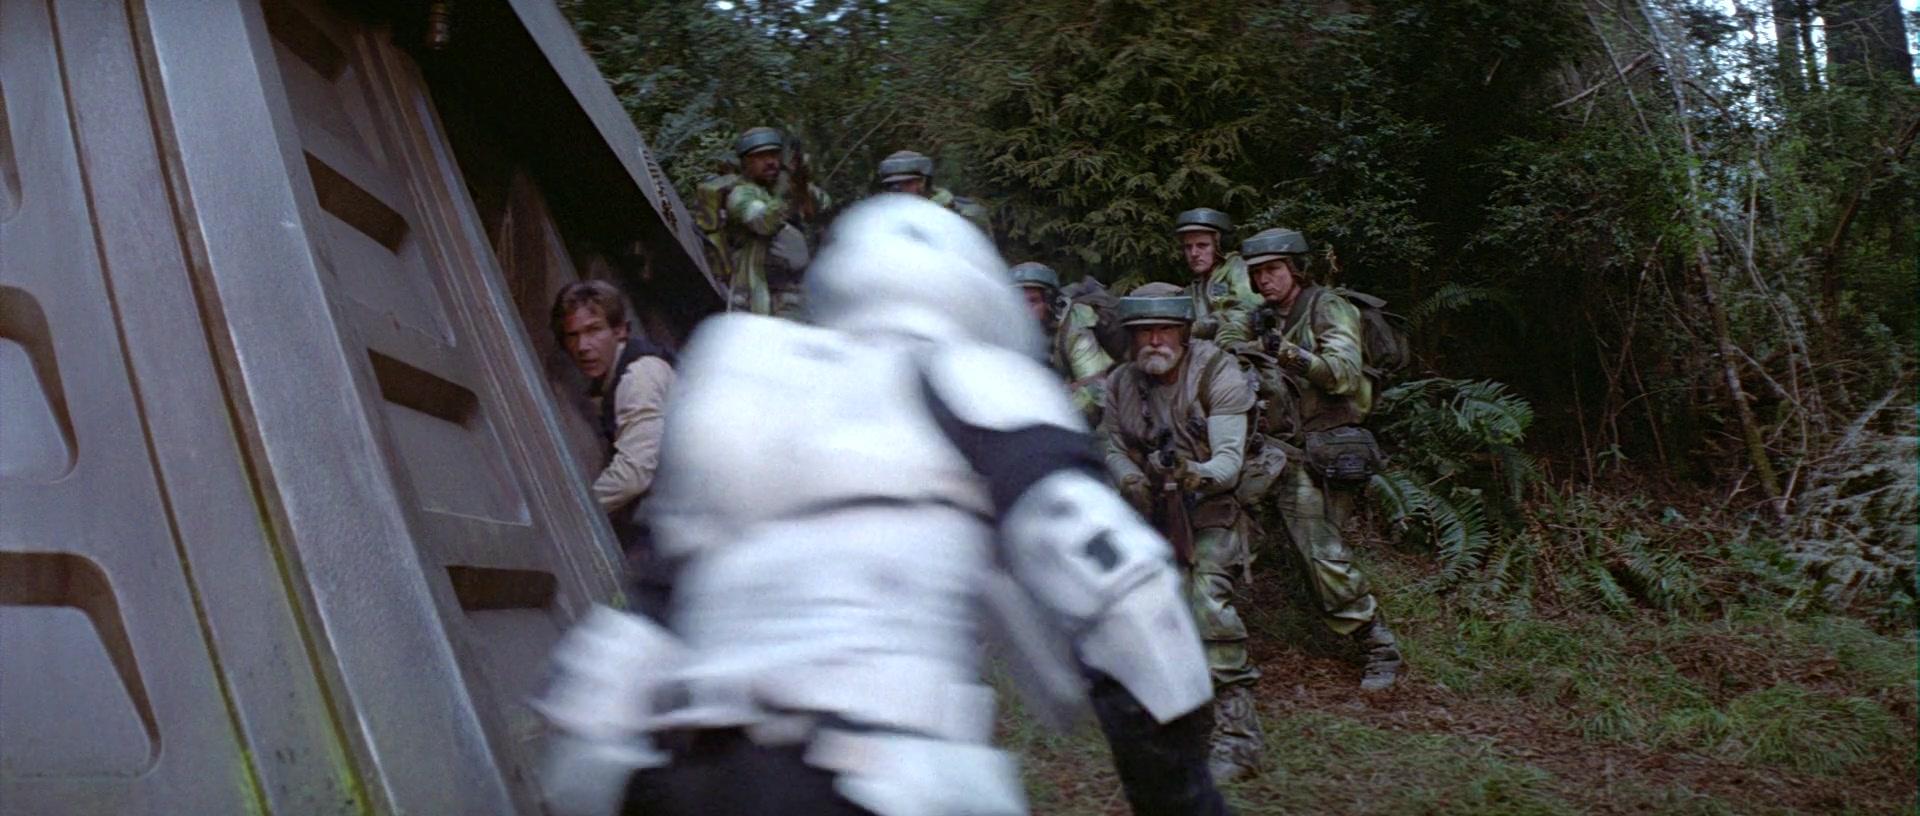 star wars return of the jedi han solo rex